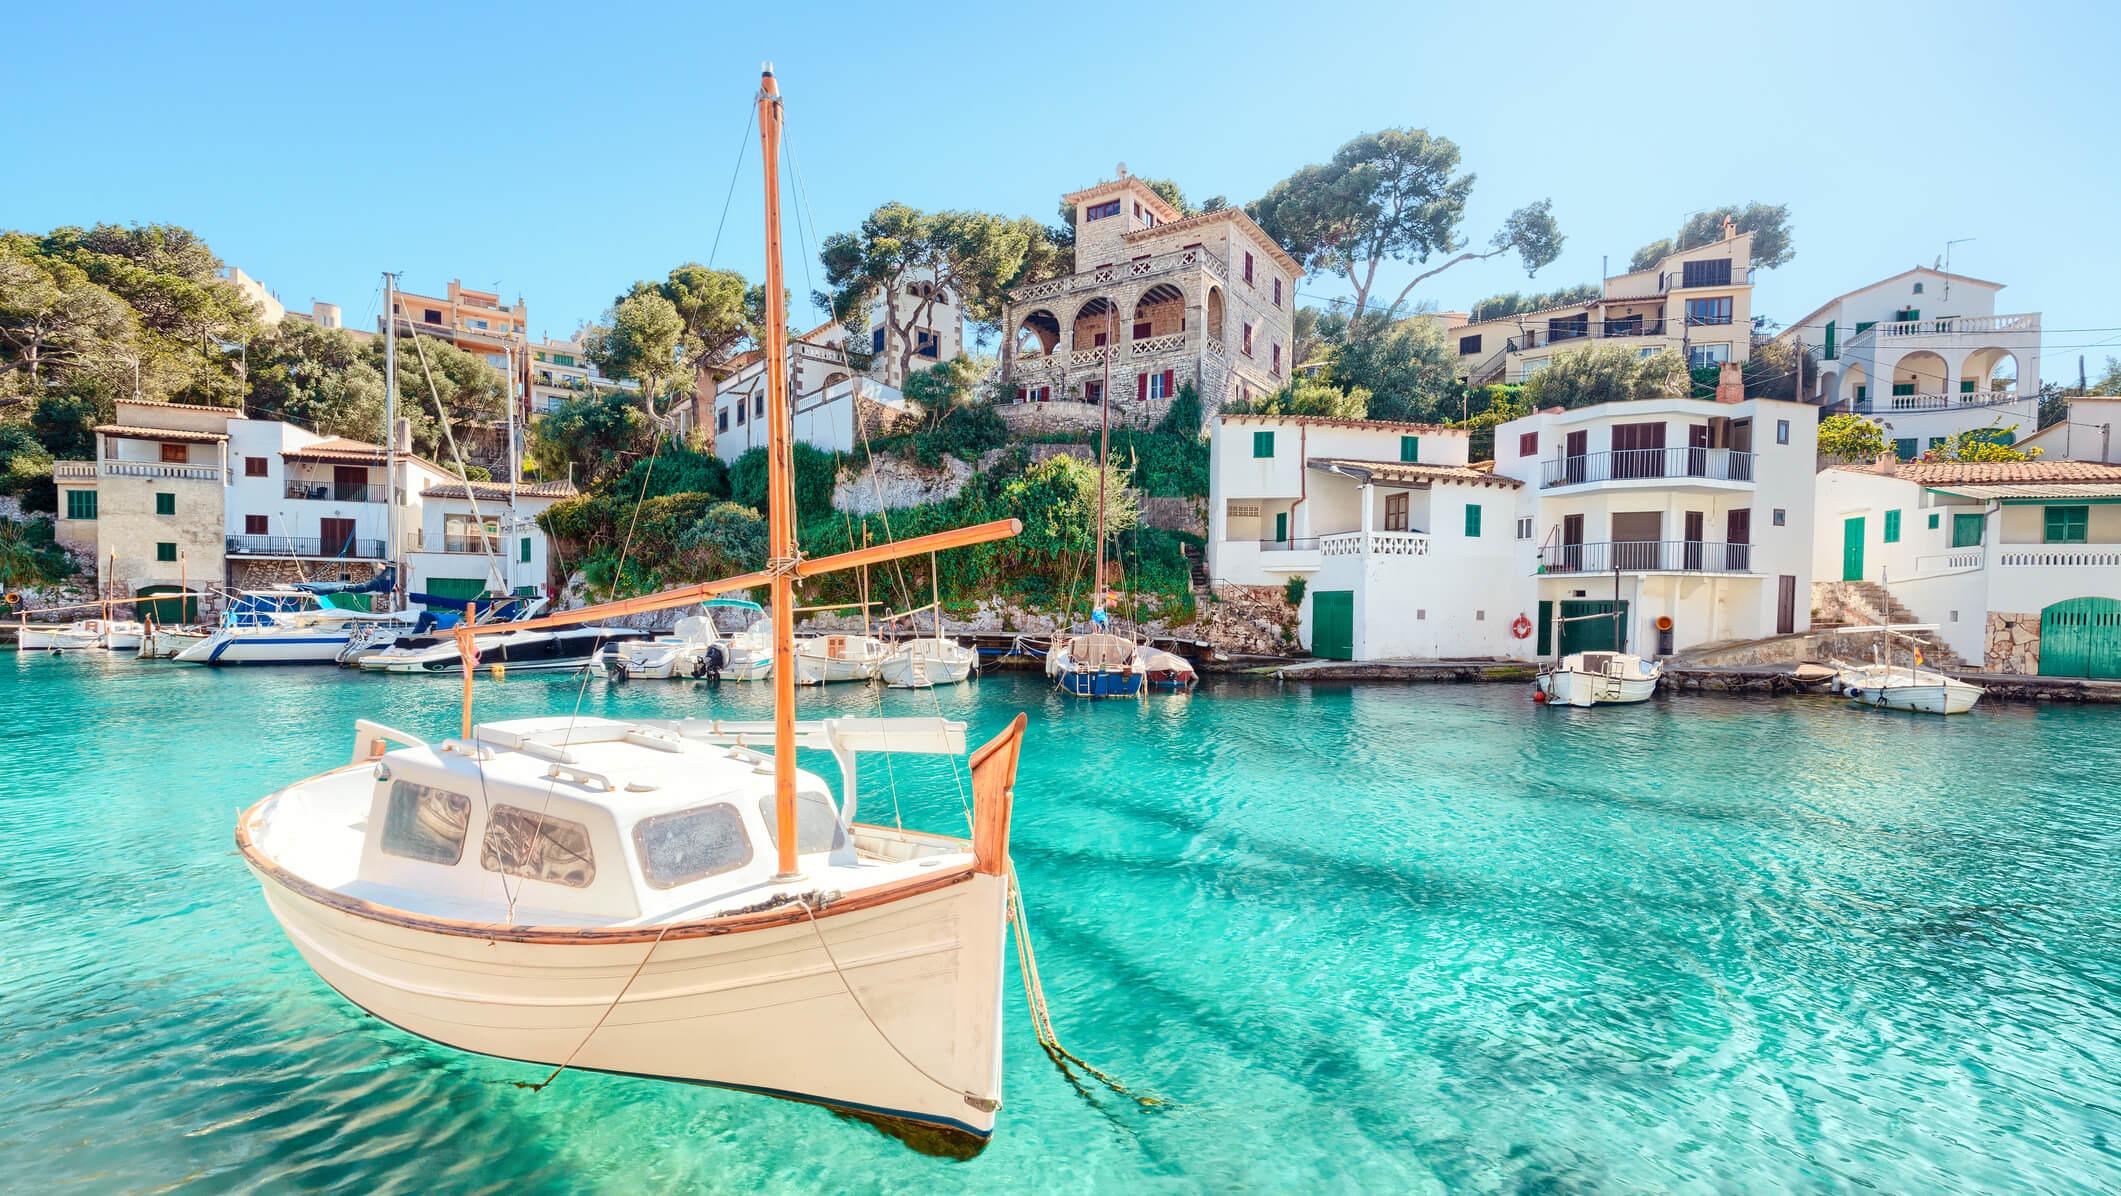 Picturesque villages in Mallorca - Cala Figuera